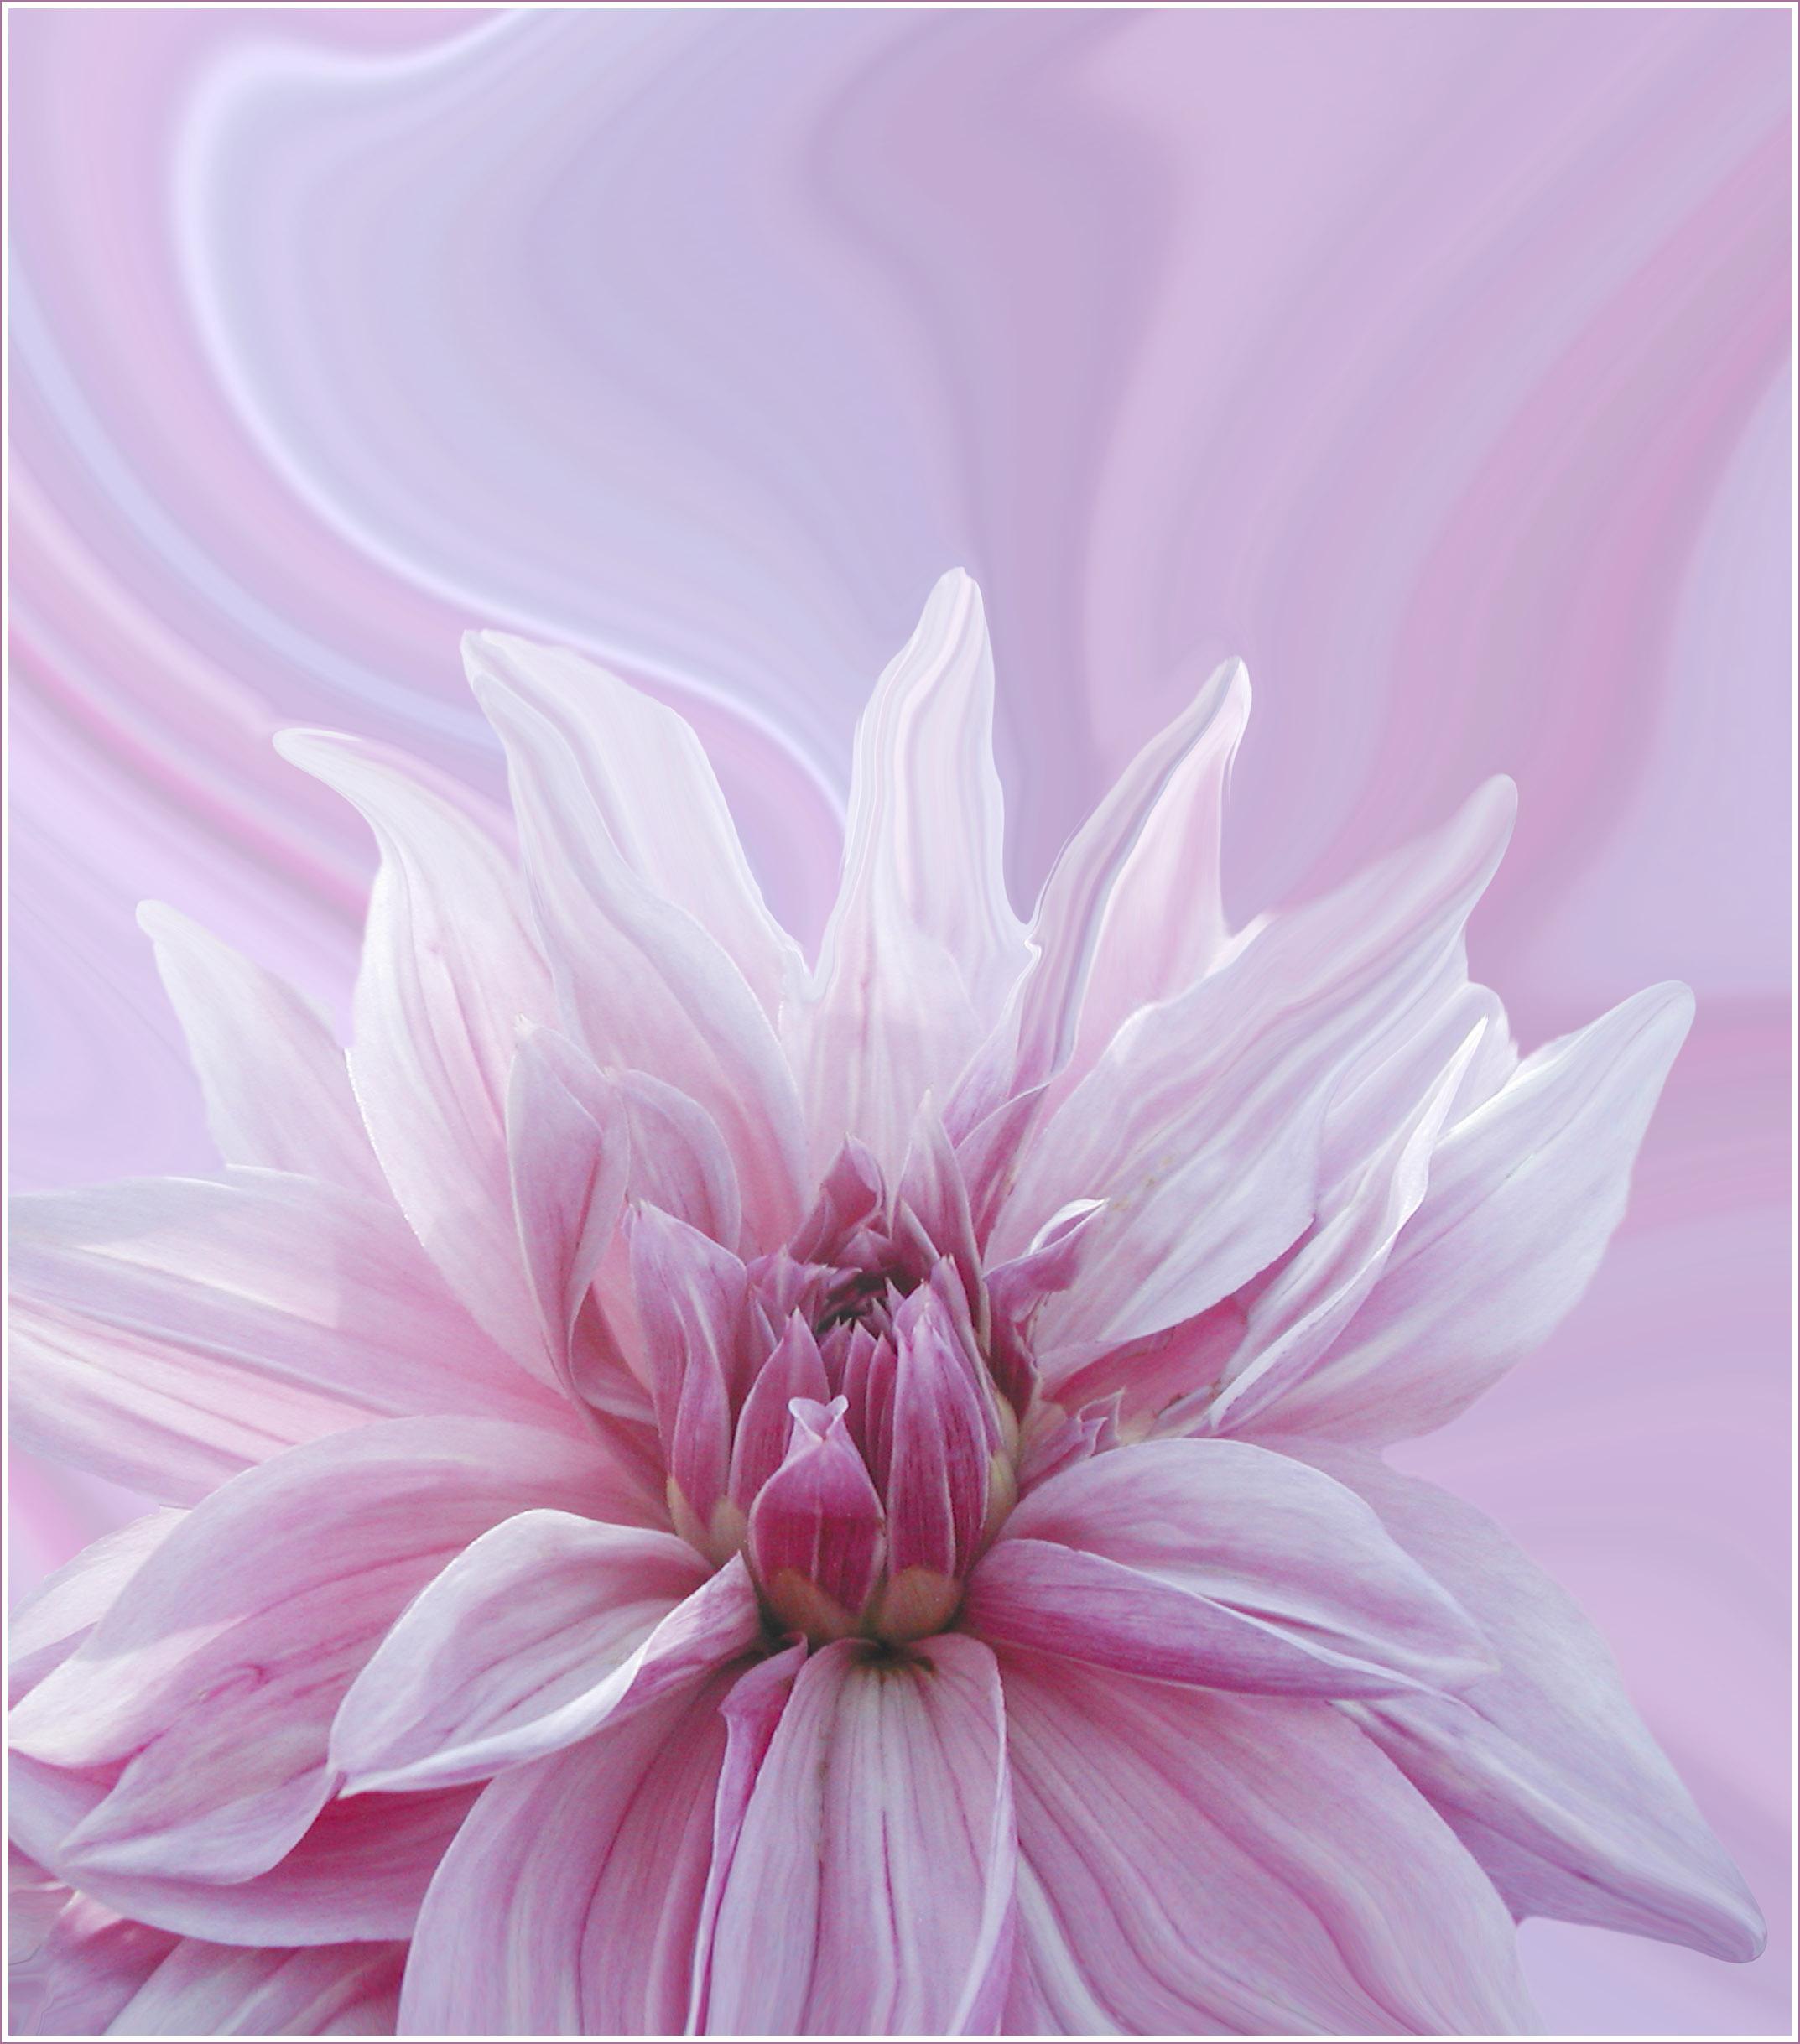 'Swirling Dahlias' by Sheila Read